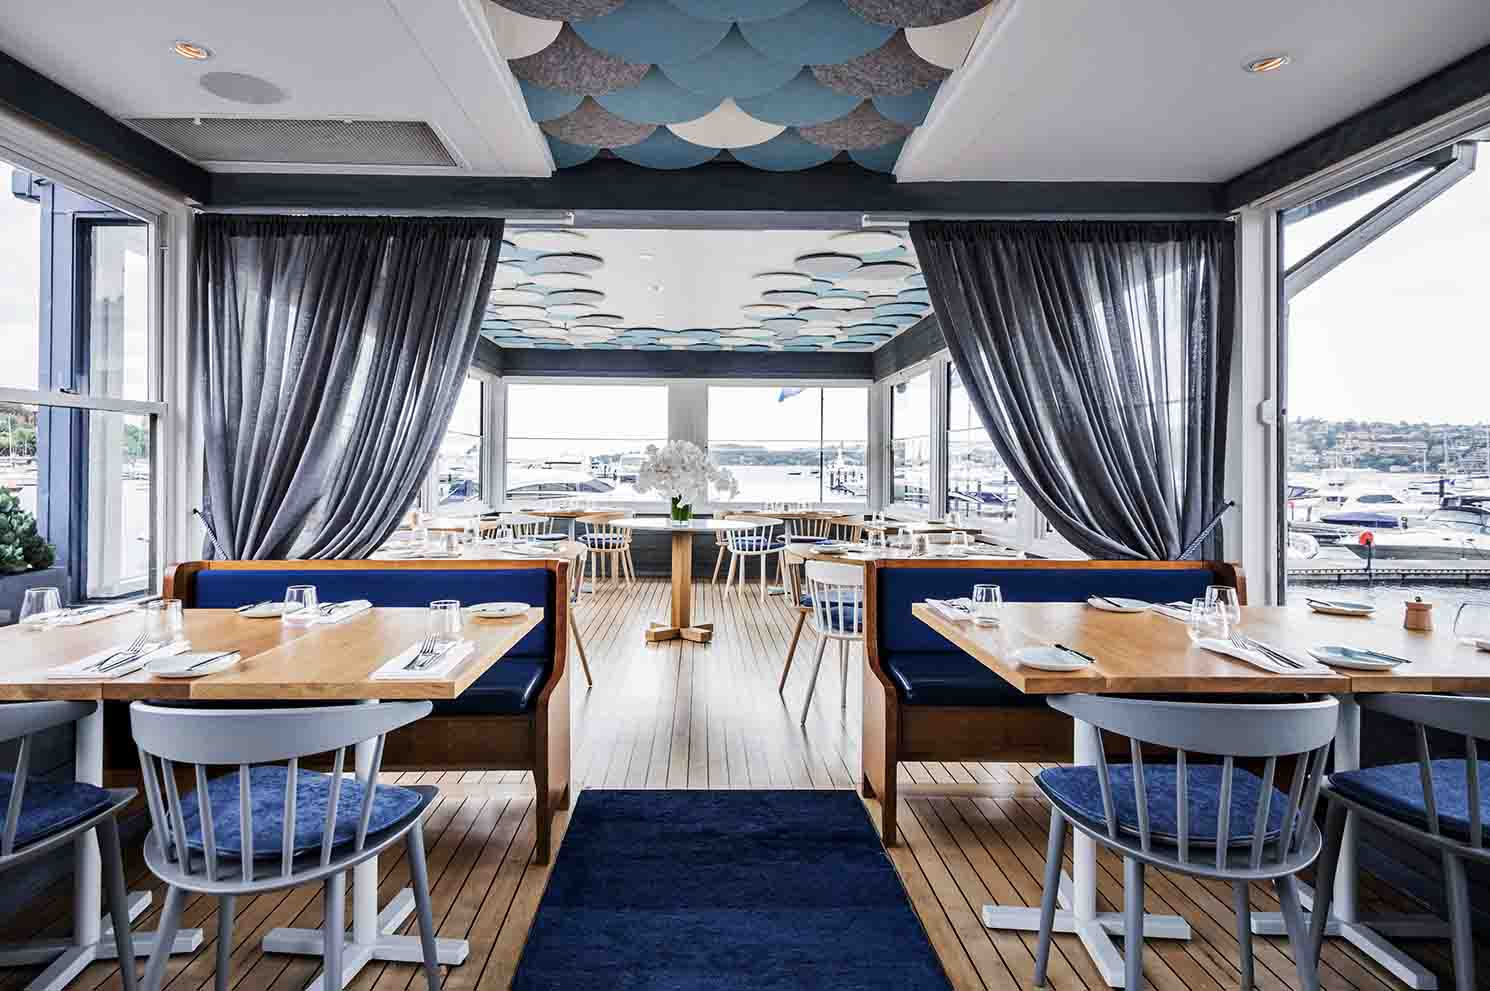 Regatta Dining – Seafood Restaurants